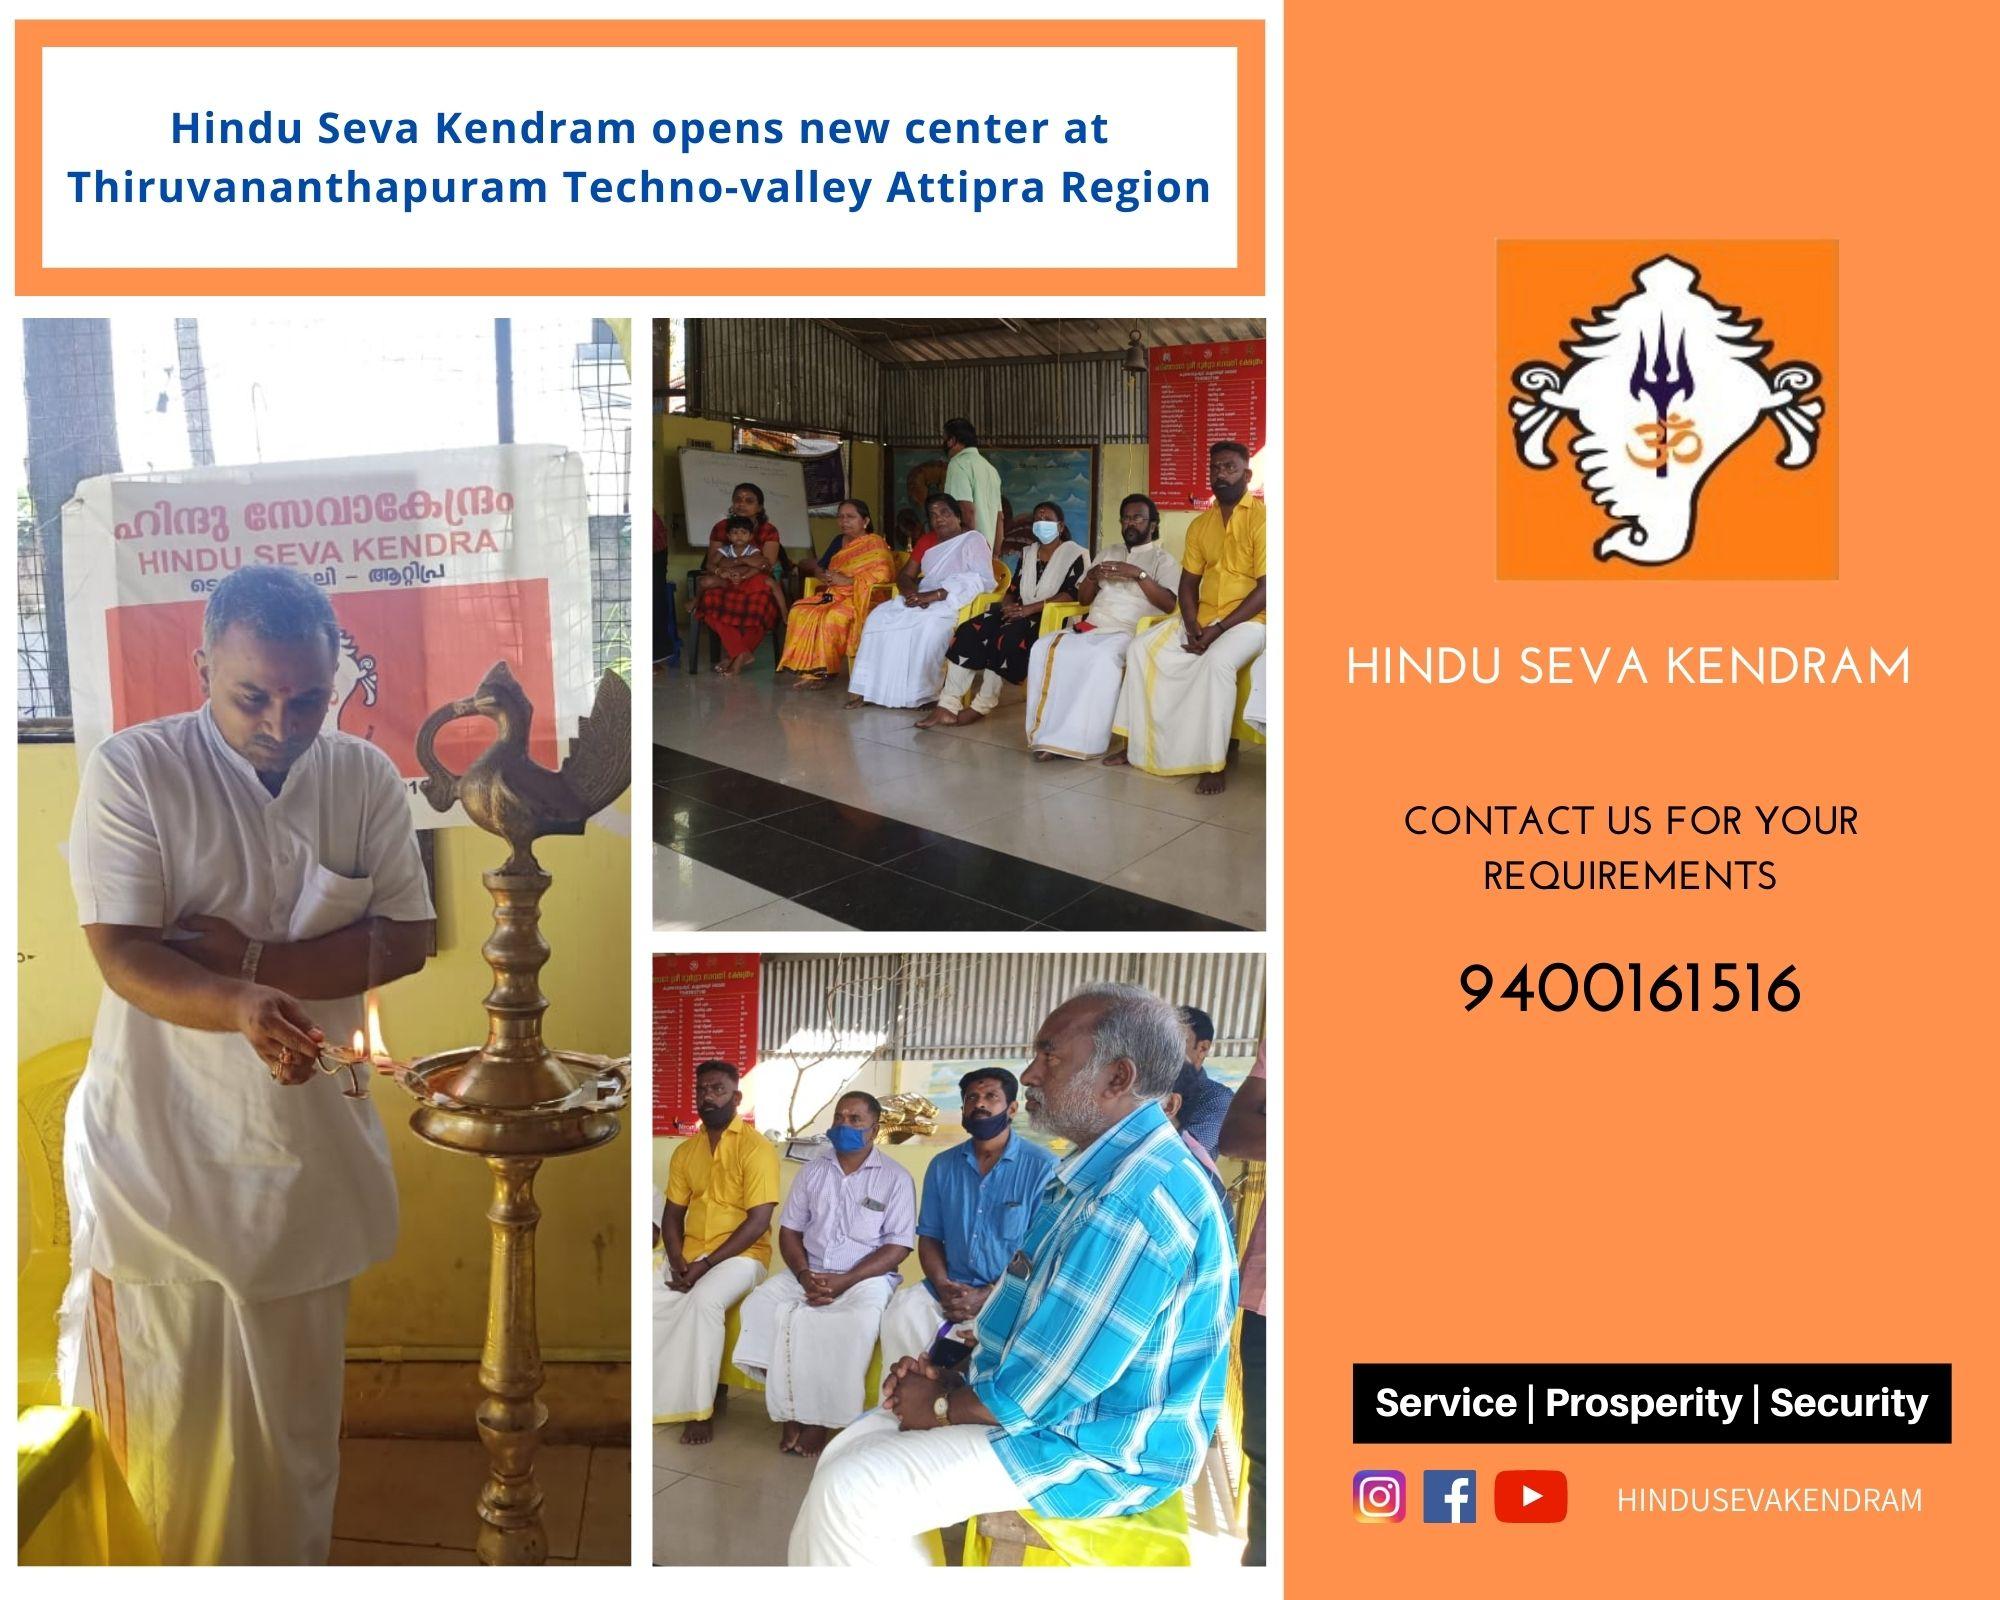 Hindu Seva Kendram opens new center at Thiruvananthapuram Technovalley Attipra Region